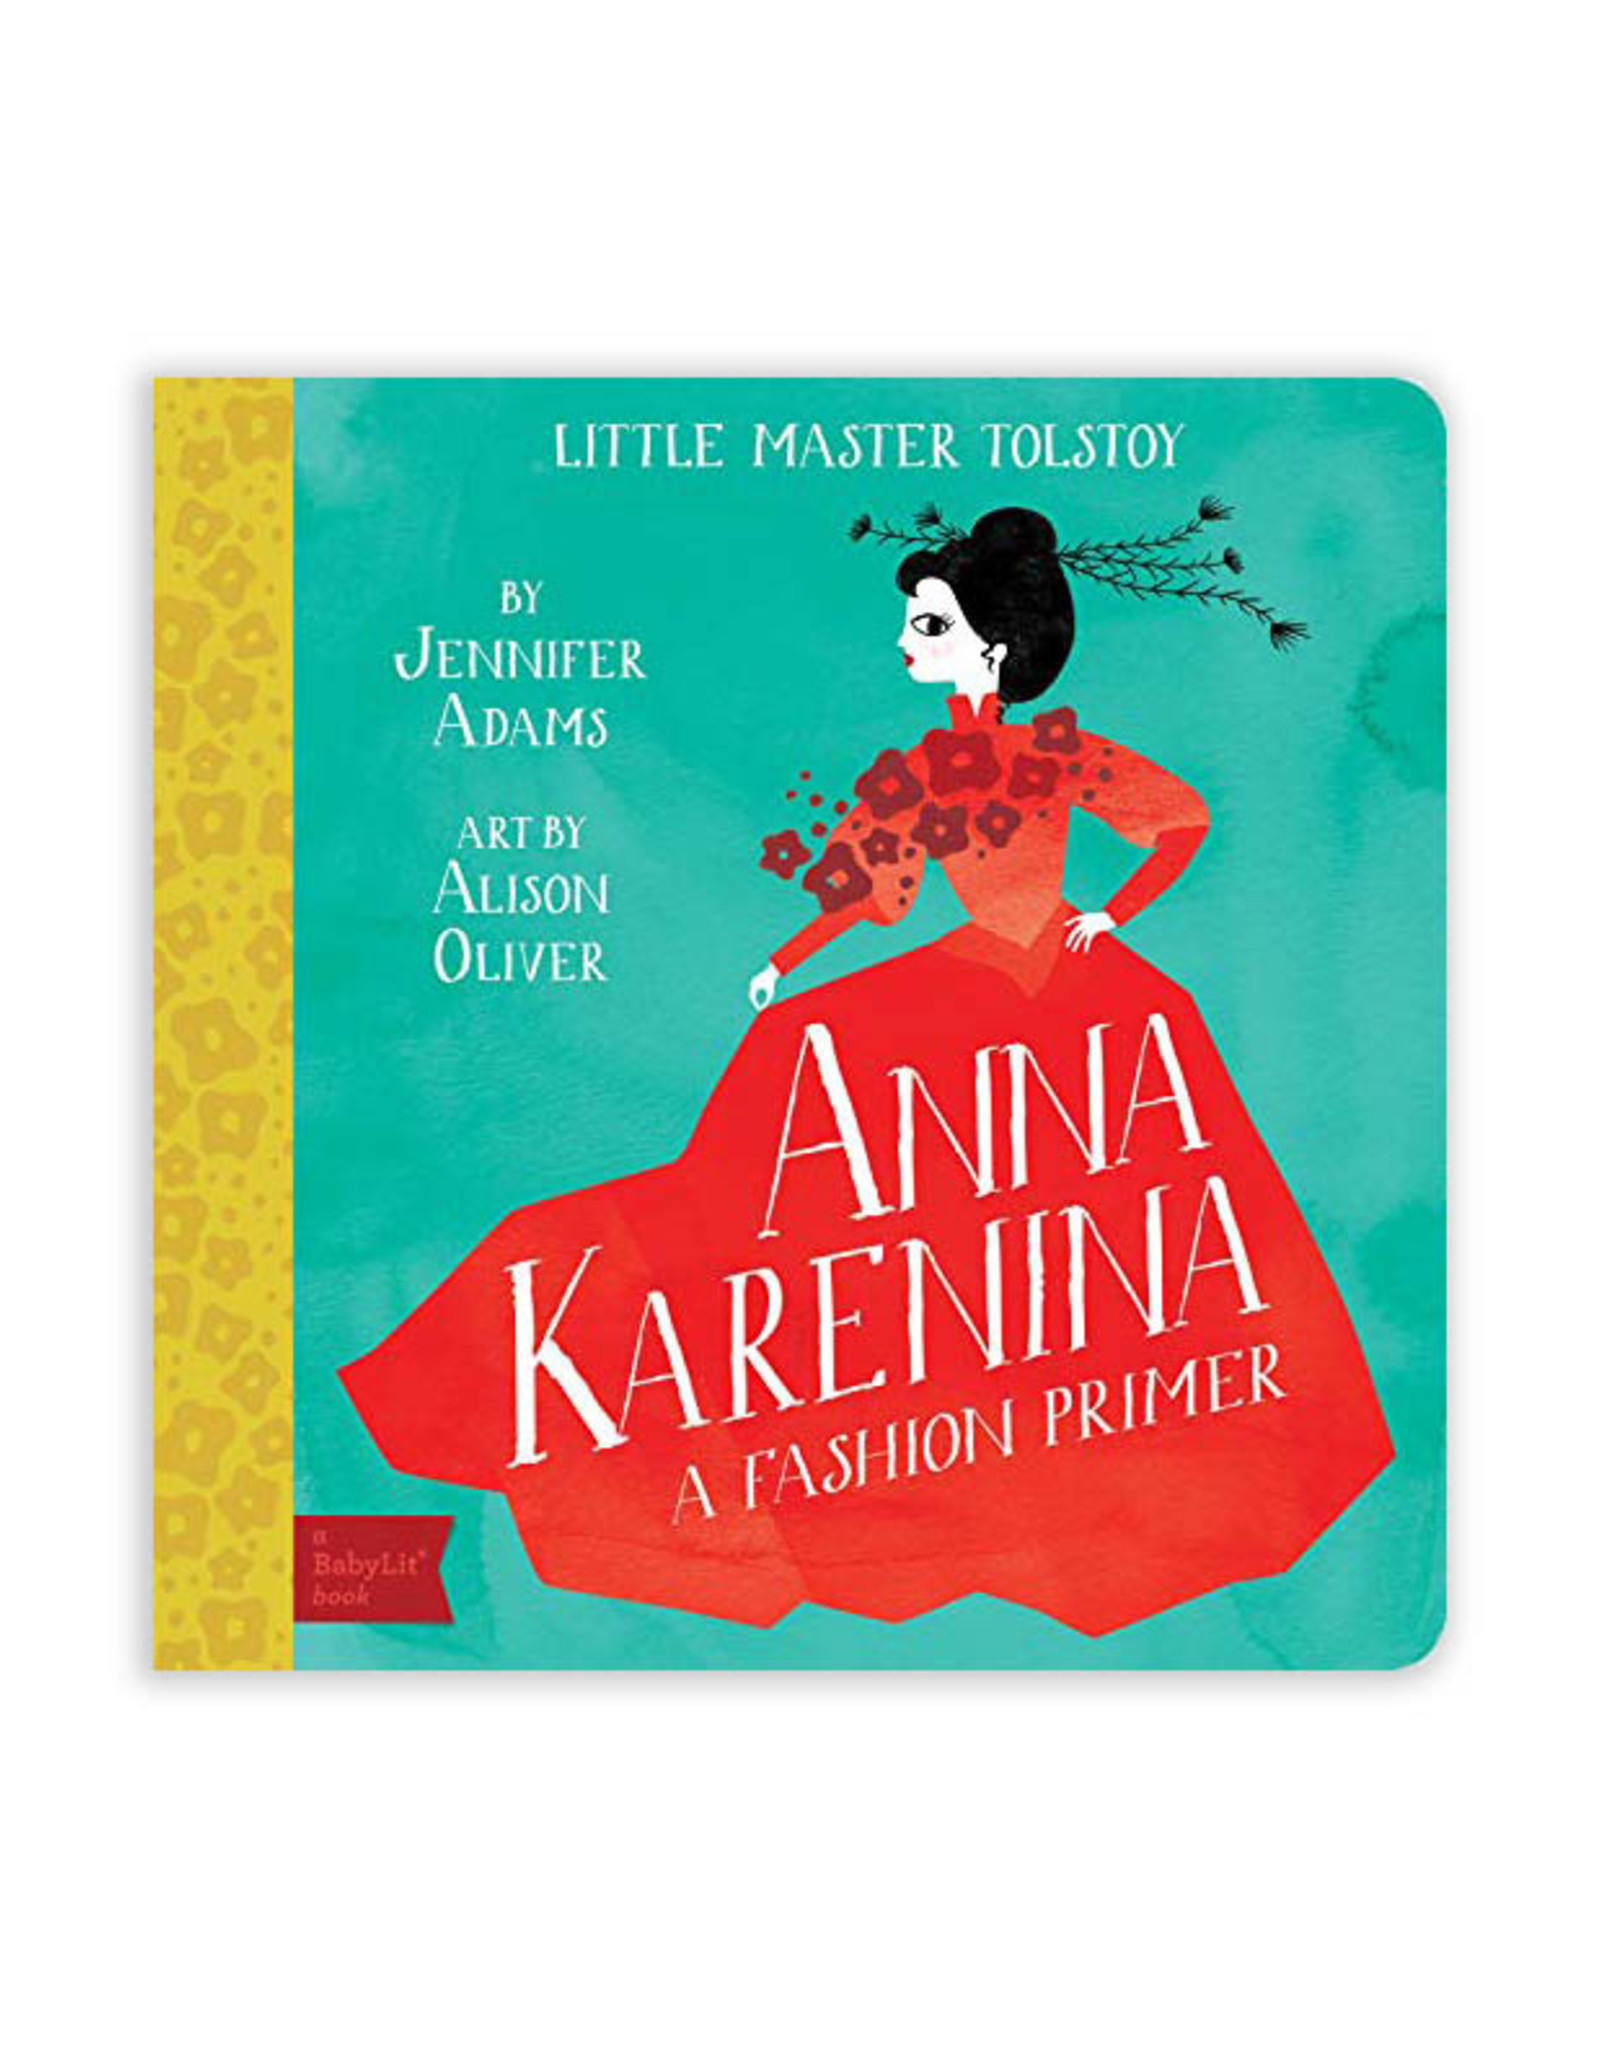 Anna Karenina Baby Lit